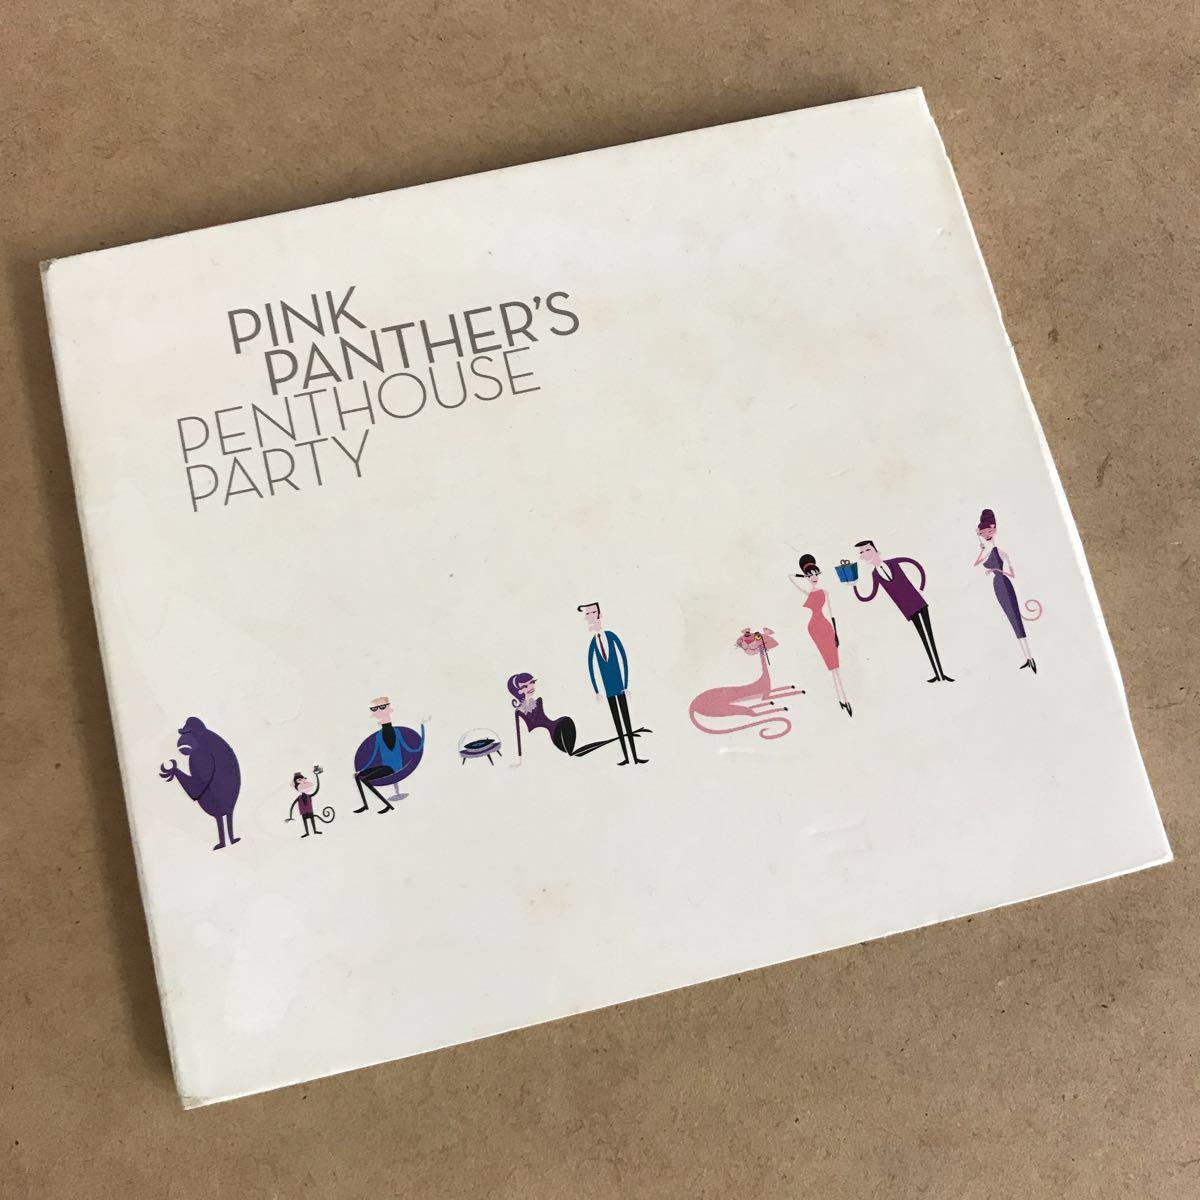 PINK PANTHER'S PENTHOUSE PARTY■HENRY MANCINI/PEGGY LEE/TITAN/URSULA1000/PIZZICATO FIVE/FATBOY SLIM/DIMITRI FROM PARIS/KOOP/FPM他_画像1